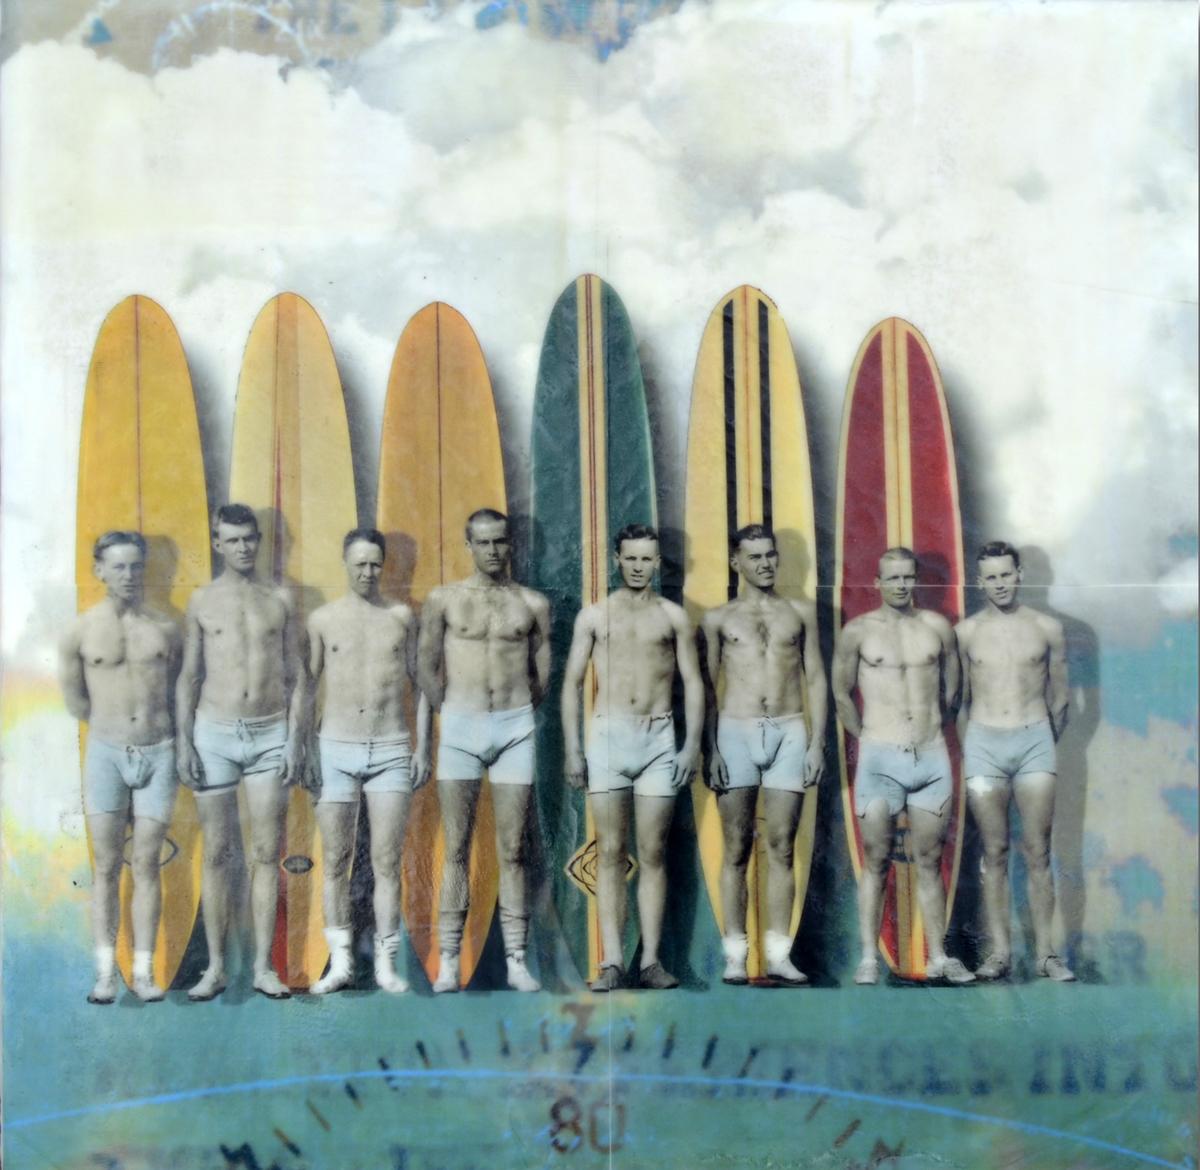 Crowe-SURFER BOYS 2 24 x 24 mixed media.jpg